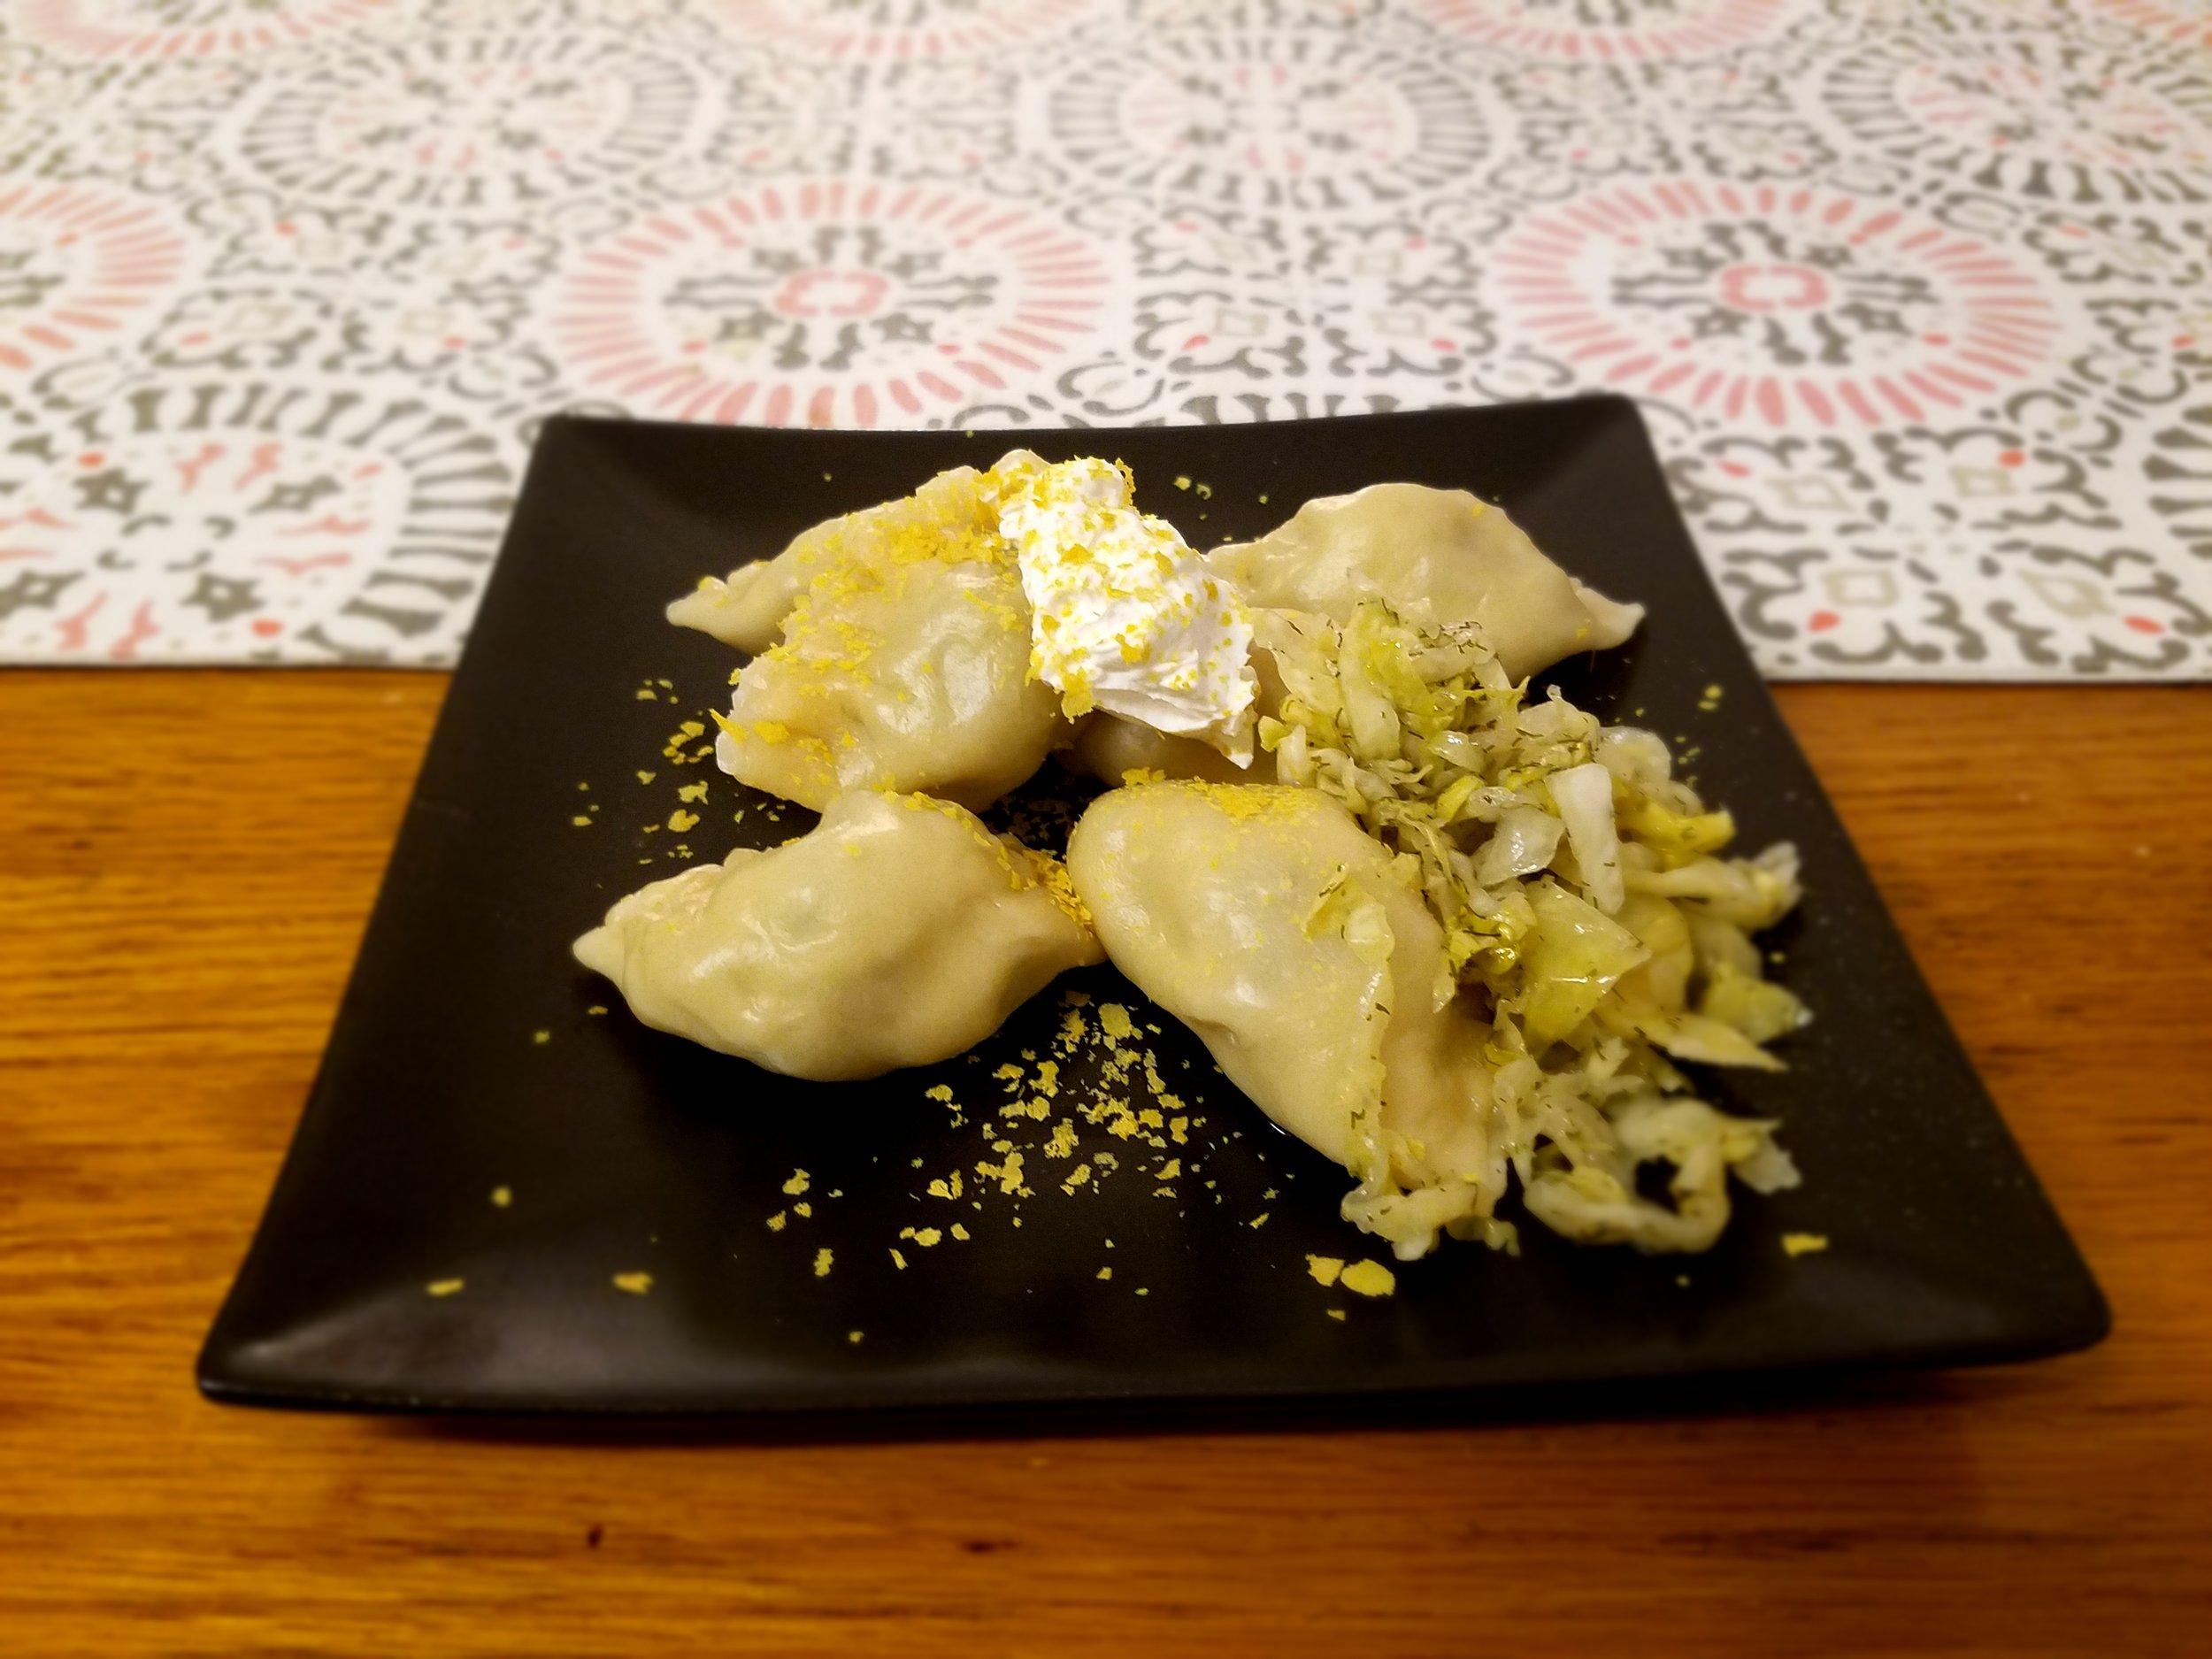 Served with vegan sour cream, nutritional yeast, and dill lemon sauerkraut.